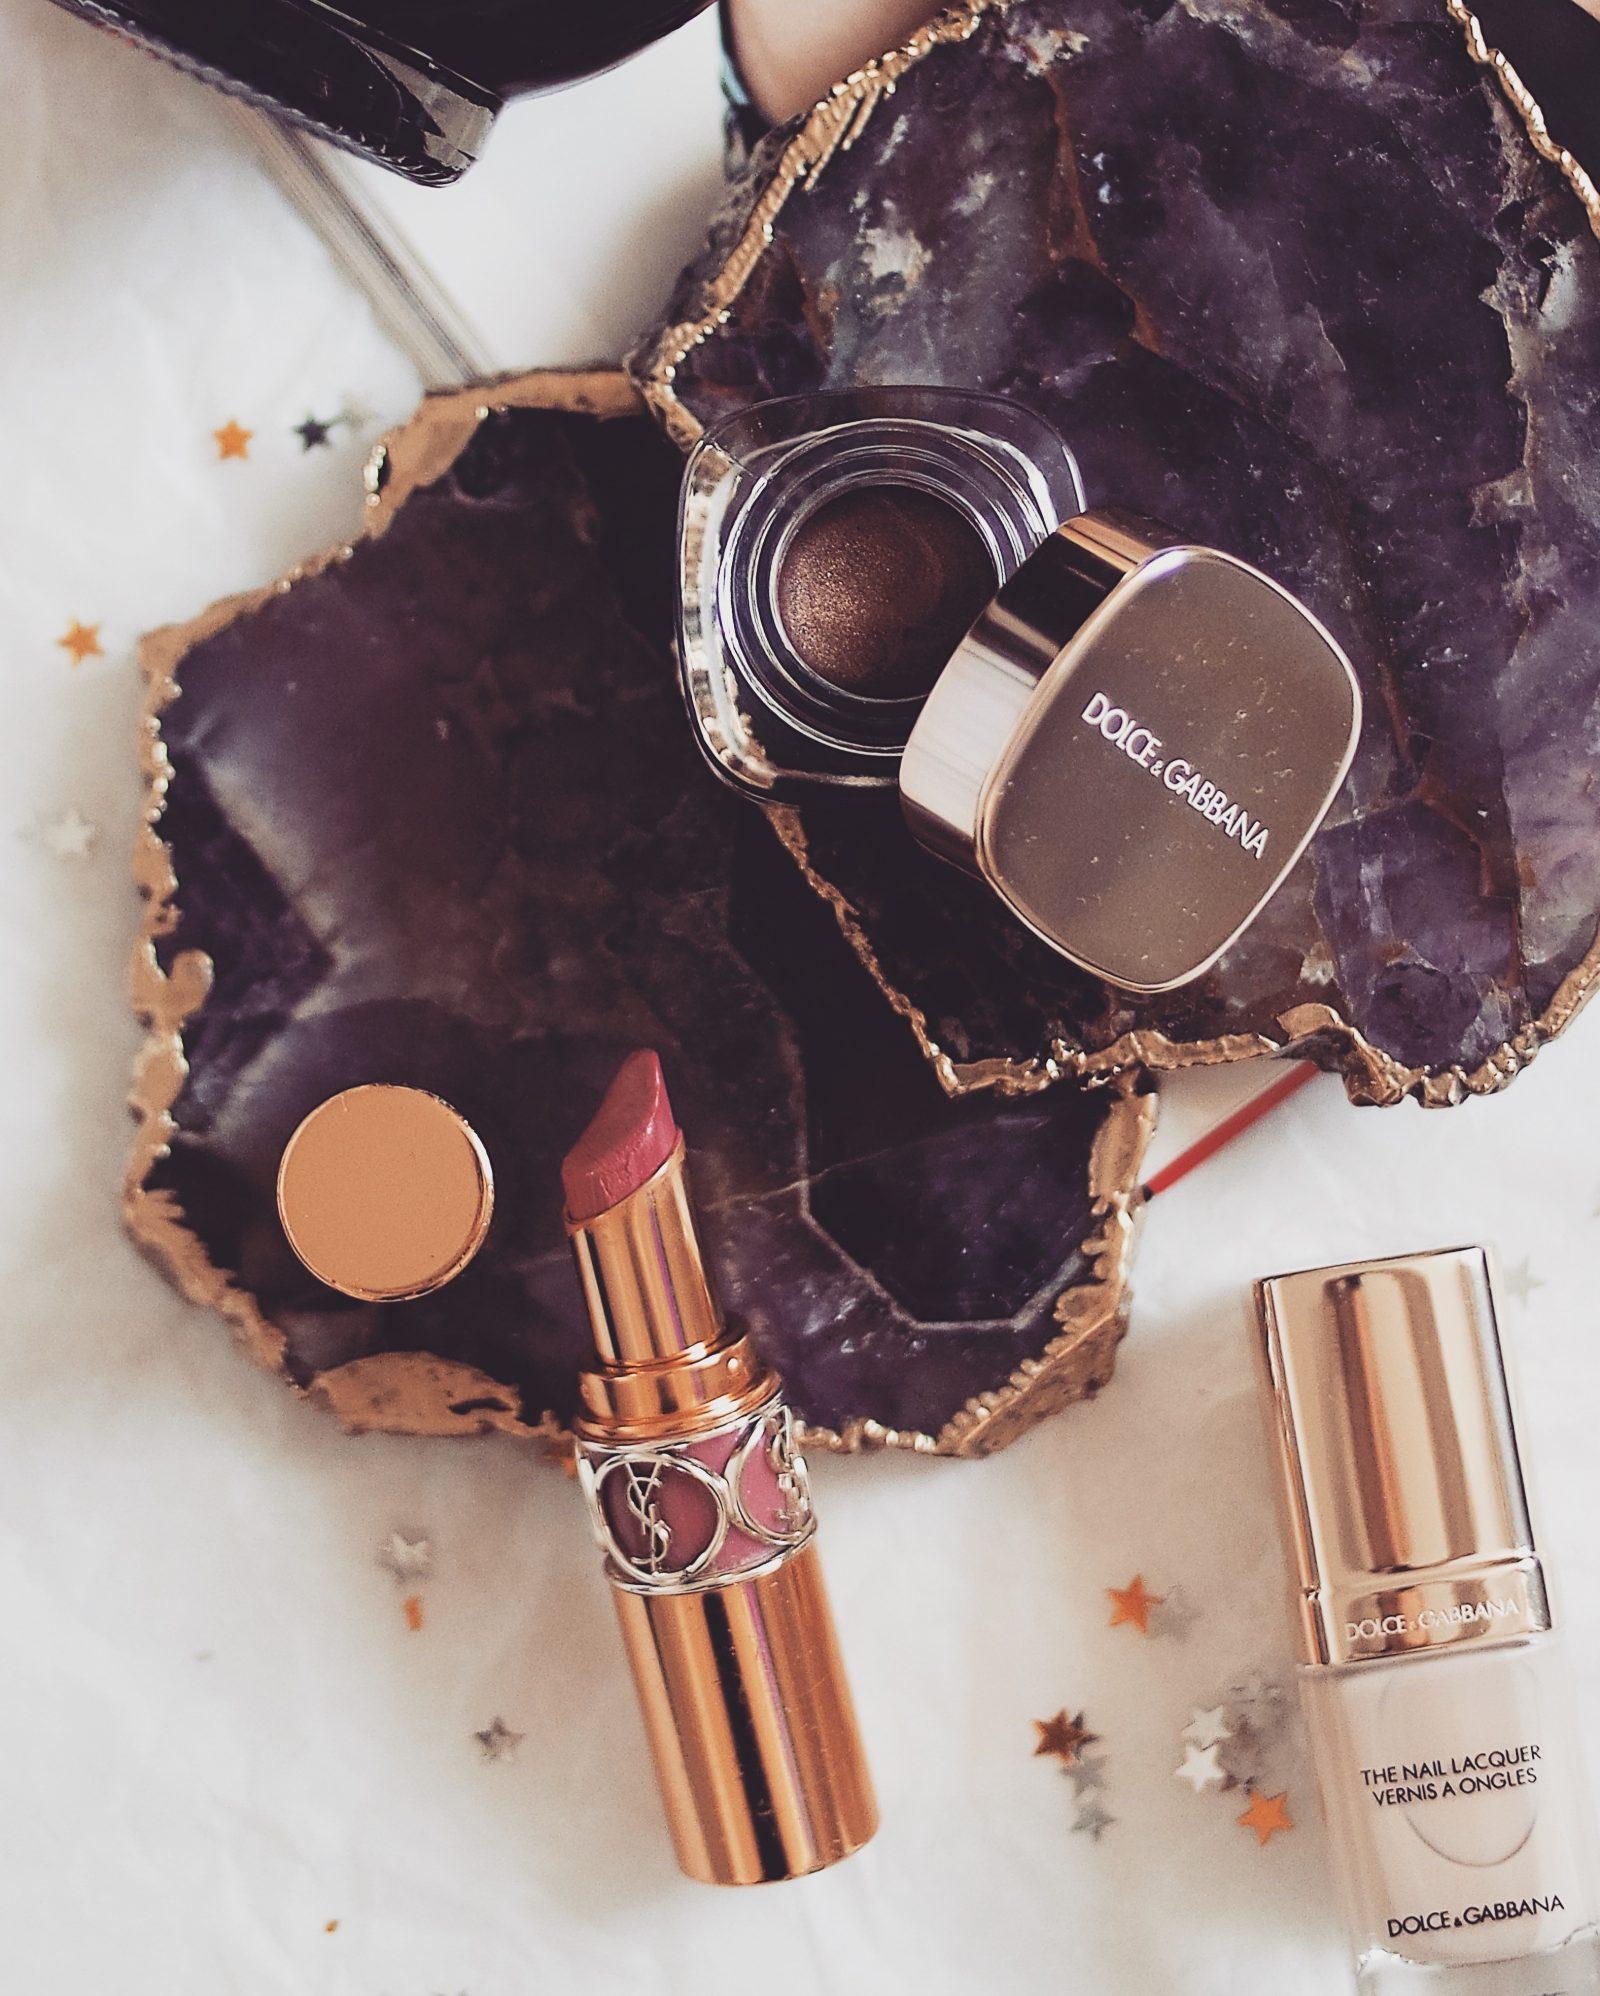 Stocking Fillers - YSL Lipstick